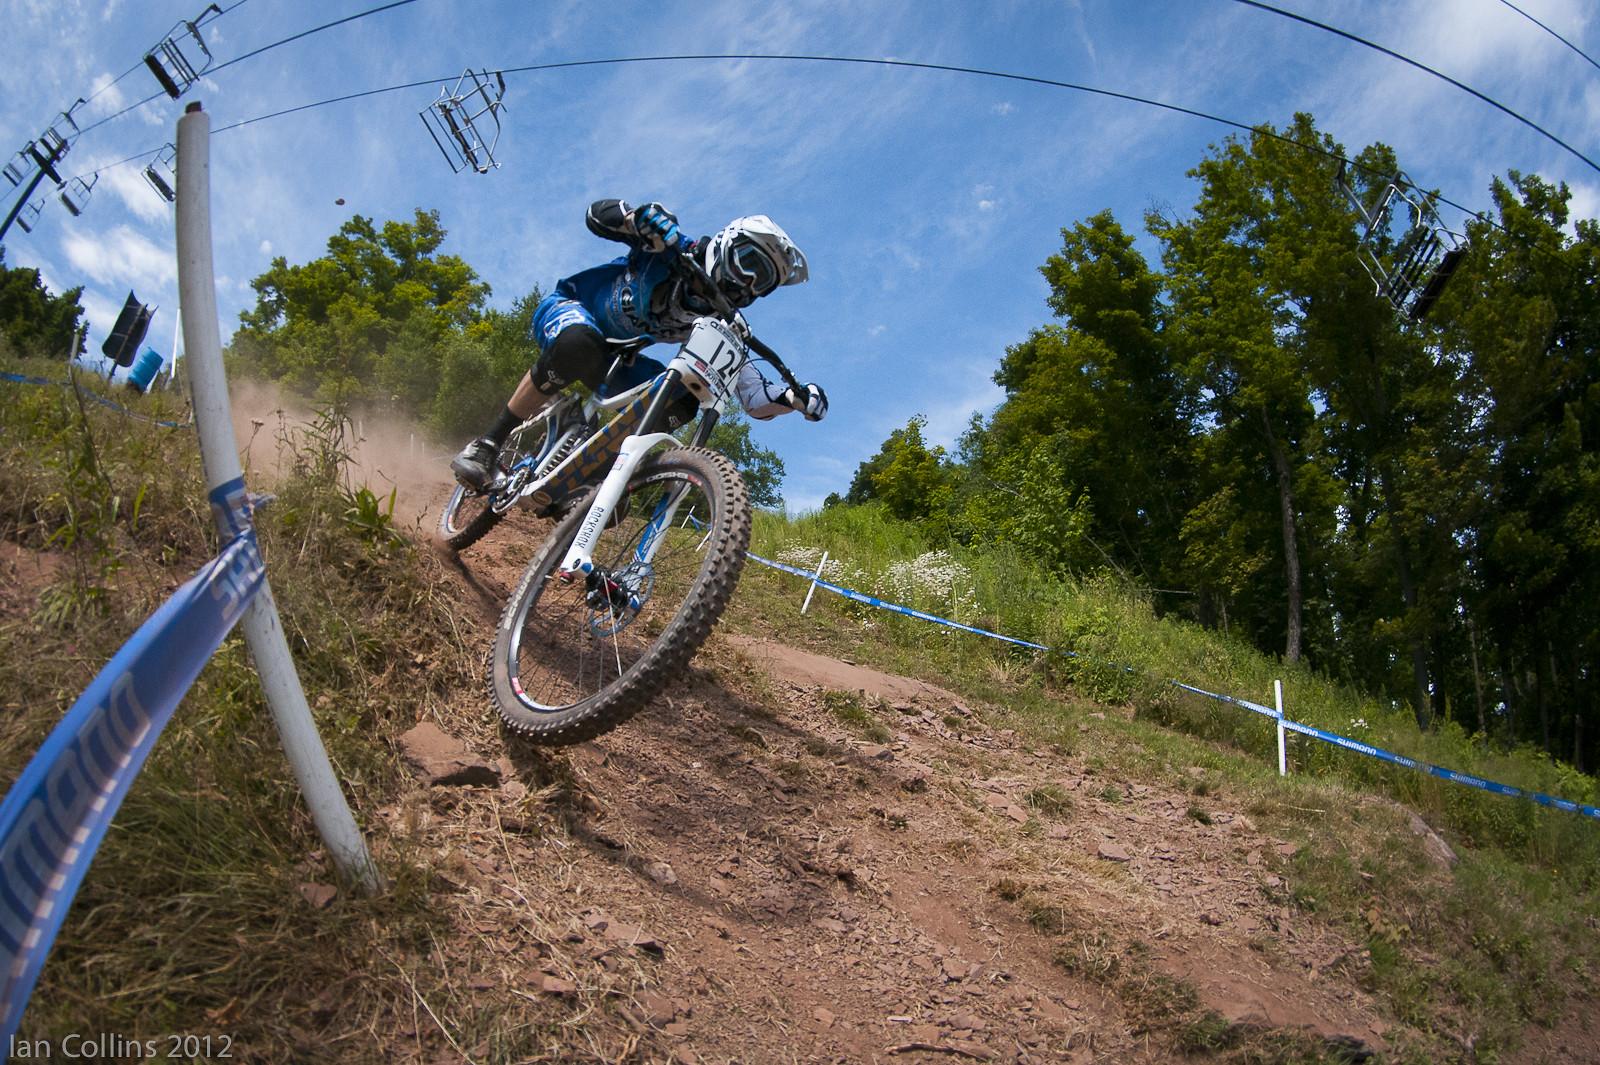 Andrew Neethling - Ian Collins - Mountain Biking Pictures - Vital MTB